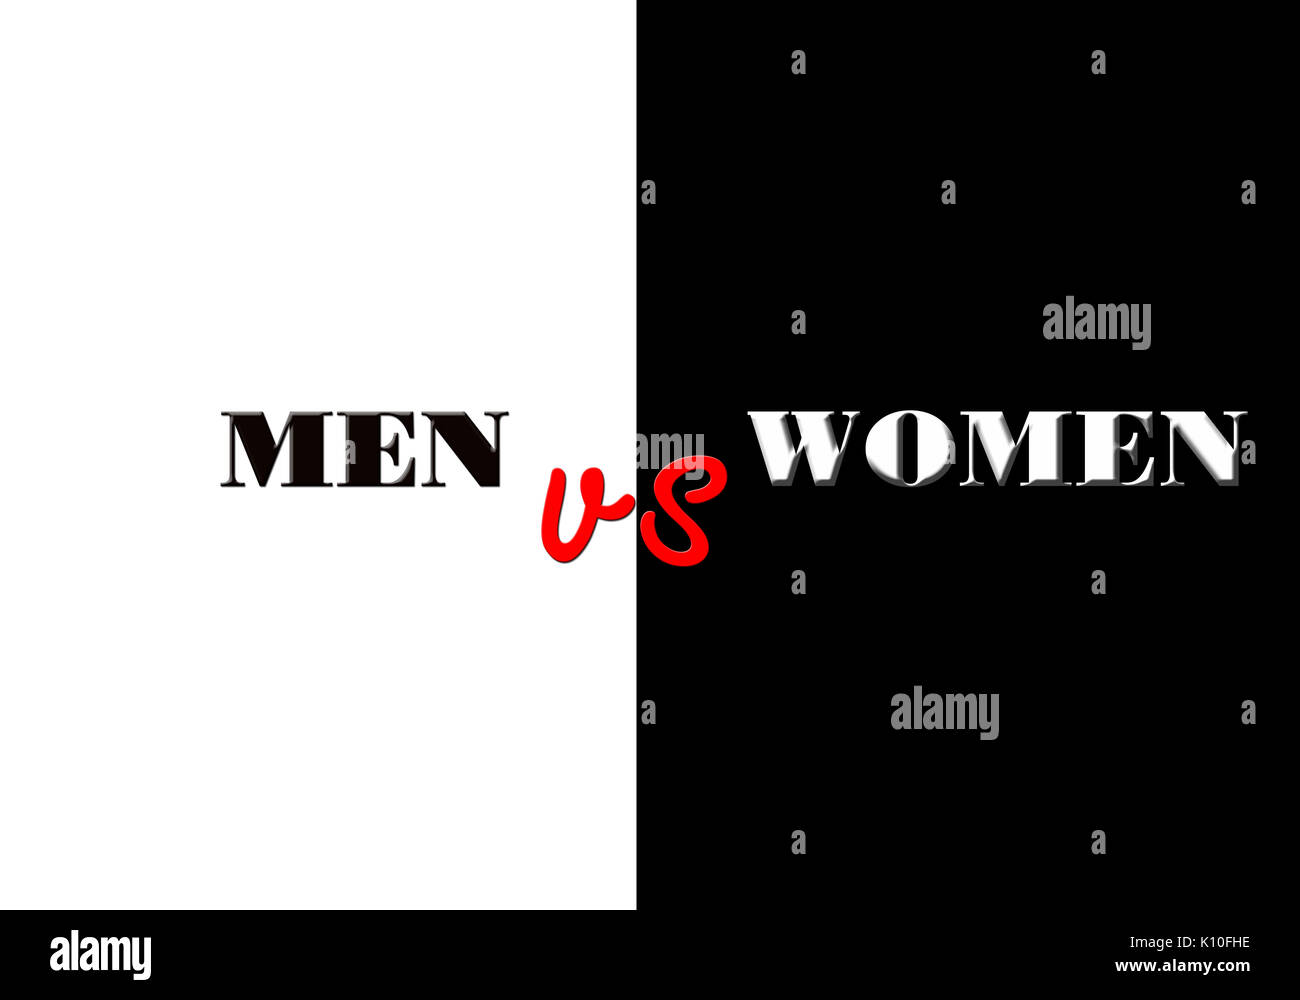 Men vs women background image design - Stock Image